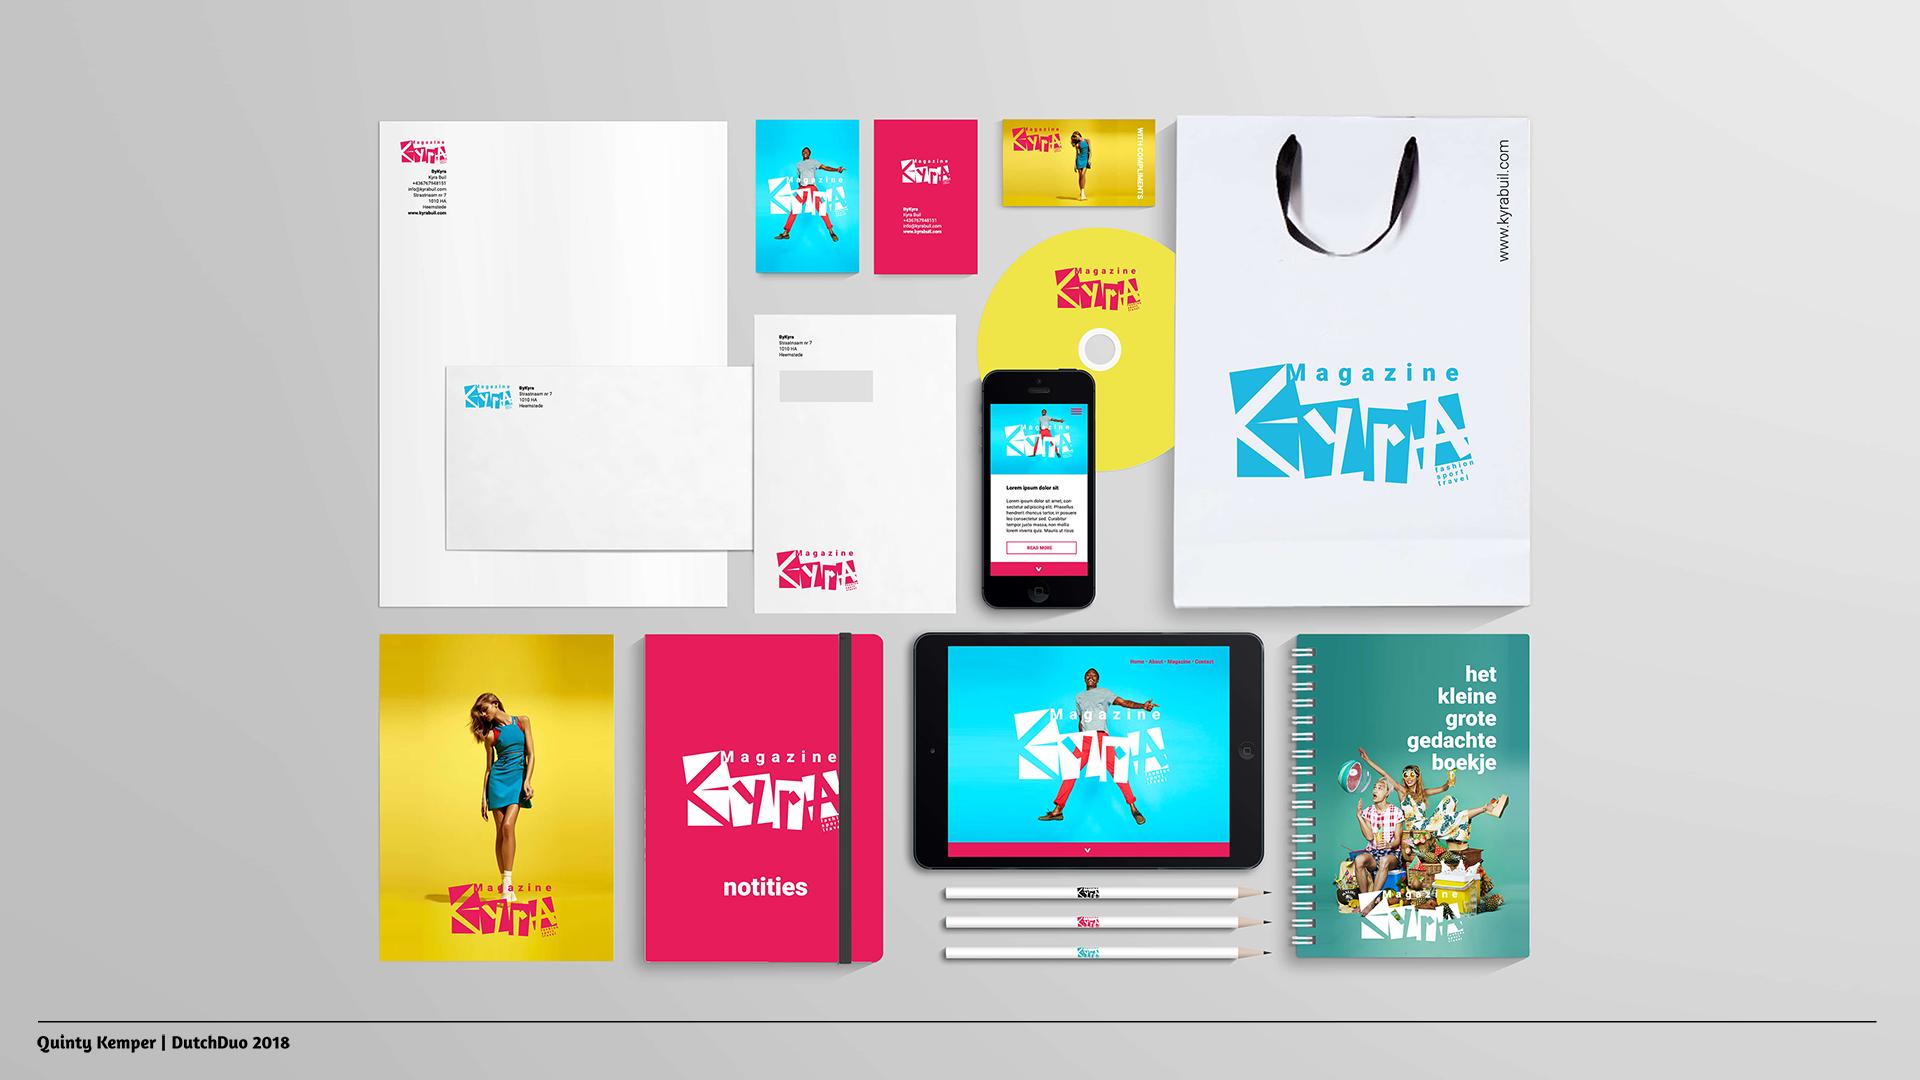 Quinty Kemper Portfolio 2018 Kyra logo 2 visual identity